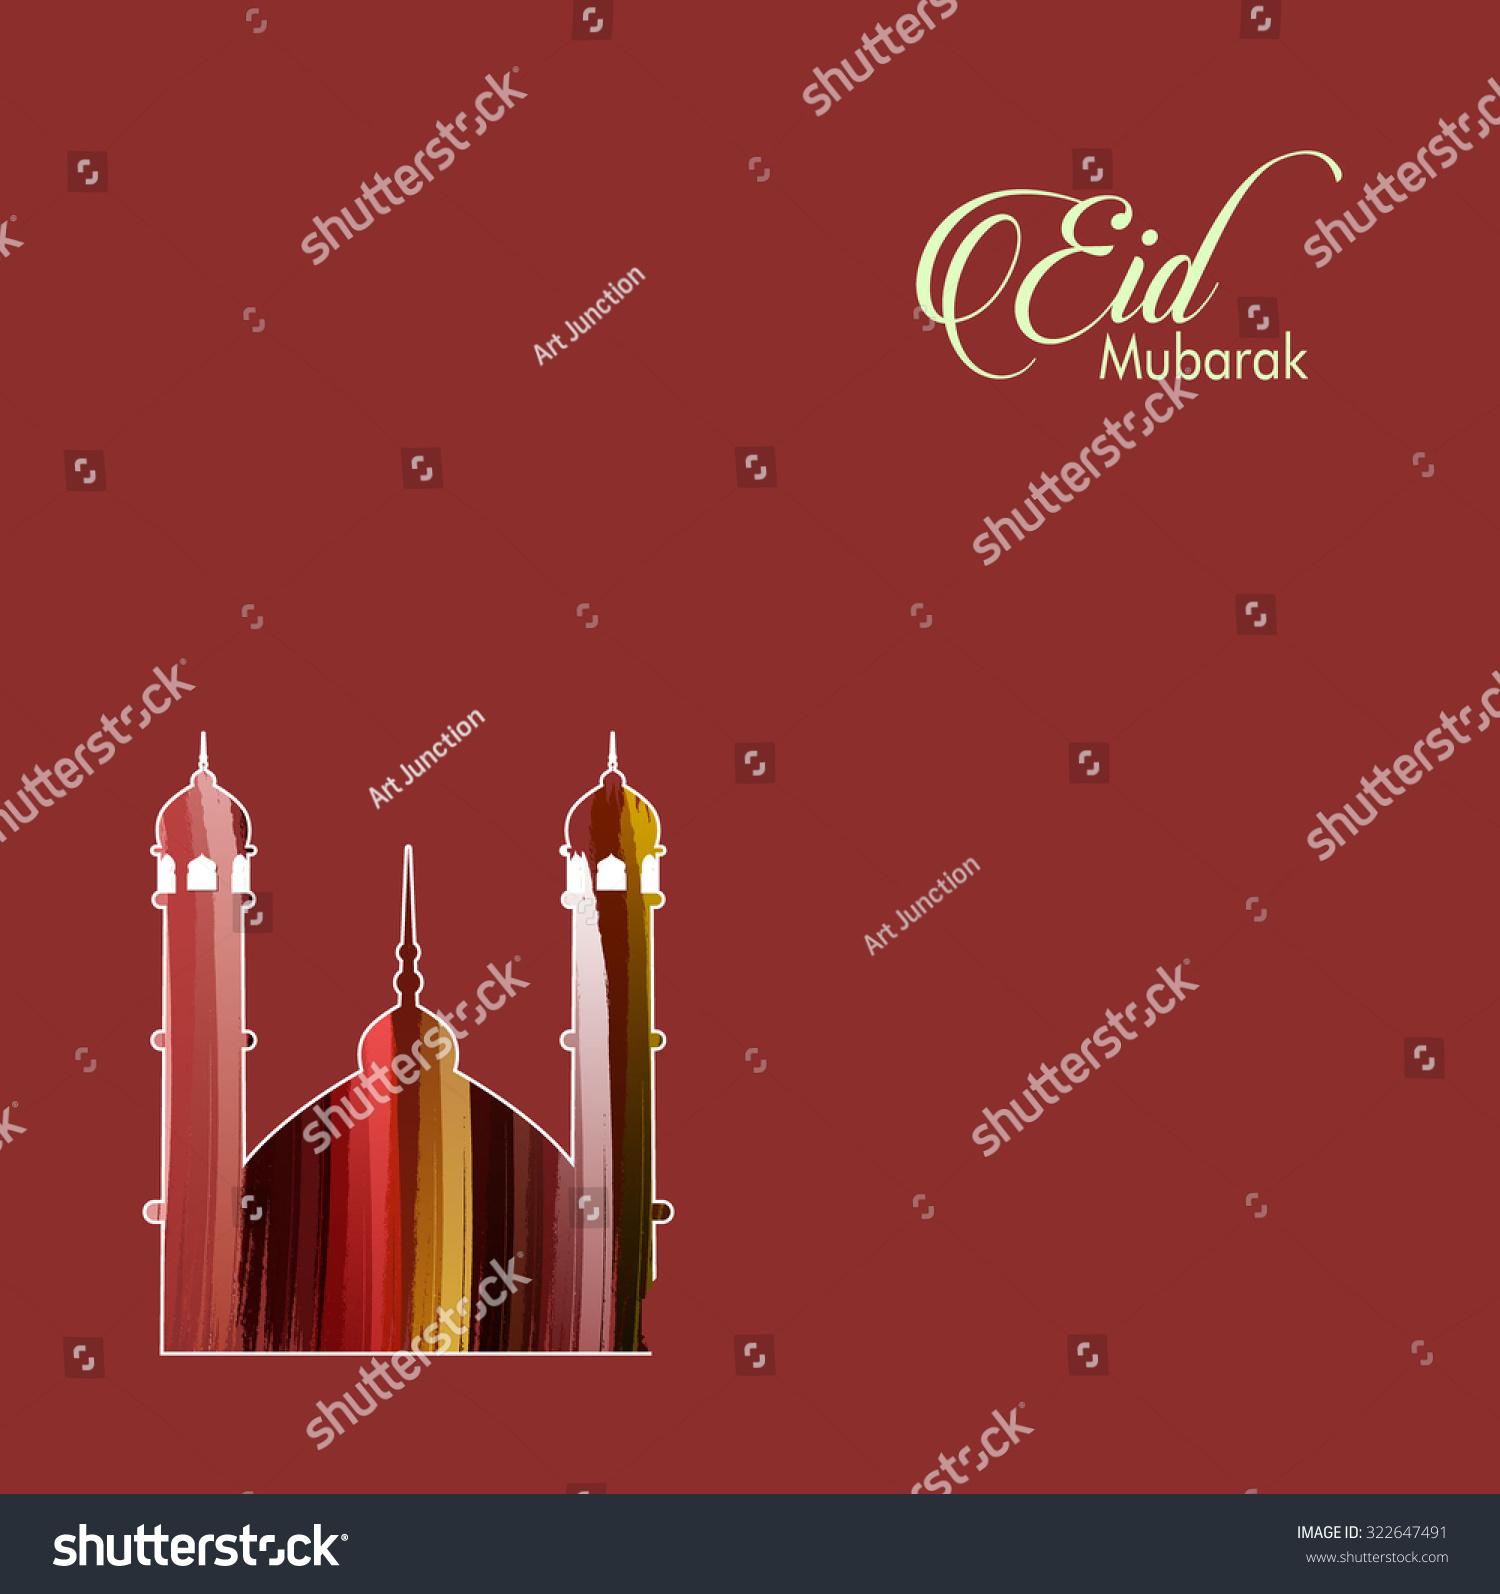 Beautiful eid mubarak card design nice stock vector 322647491 beautiful eid mubarak card design with nice mosque and colorful background eps 10 kristyandbryce Choice Image